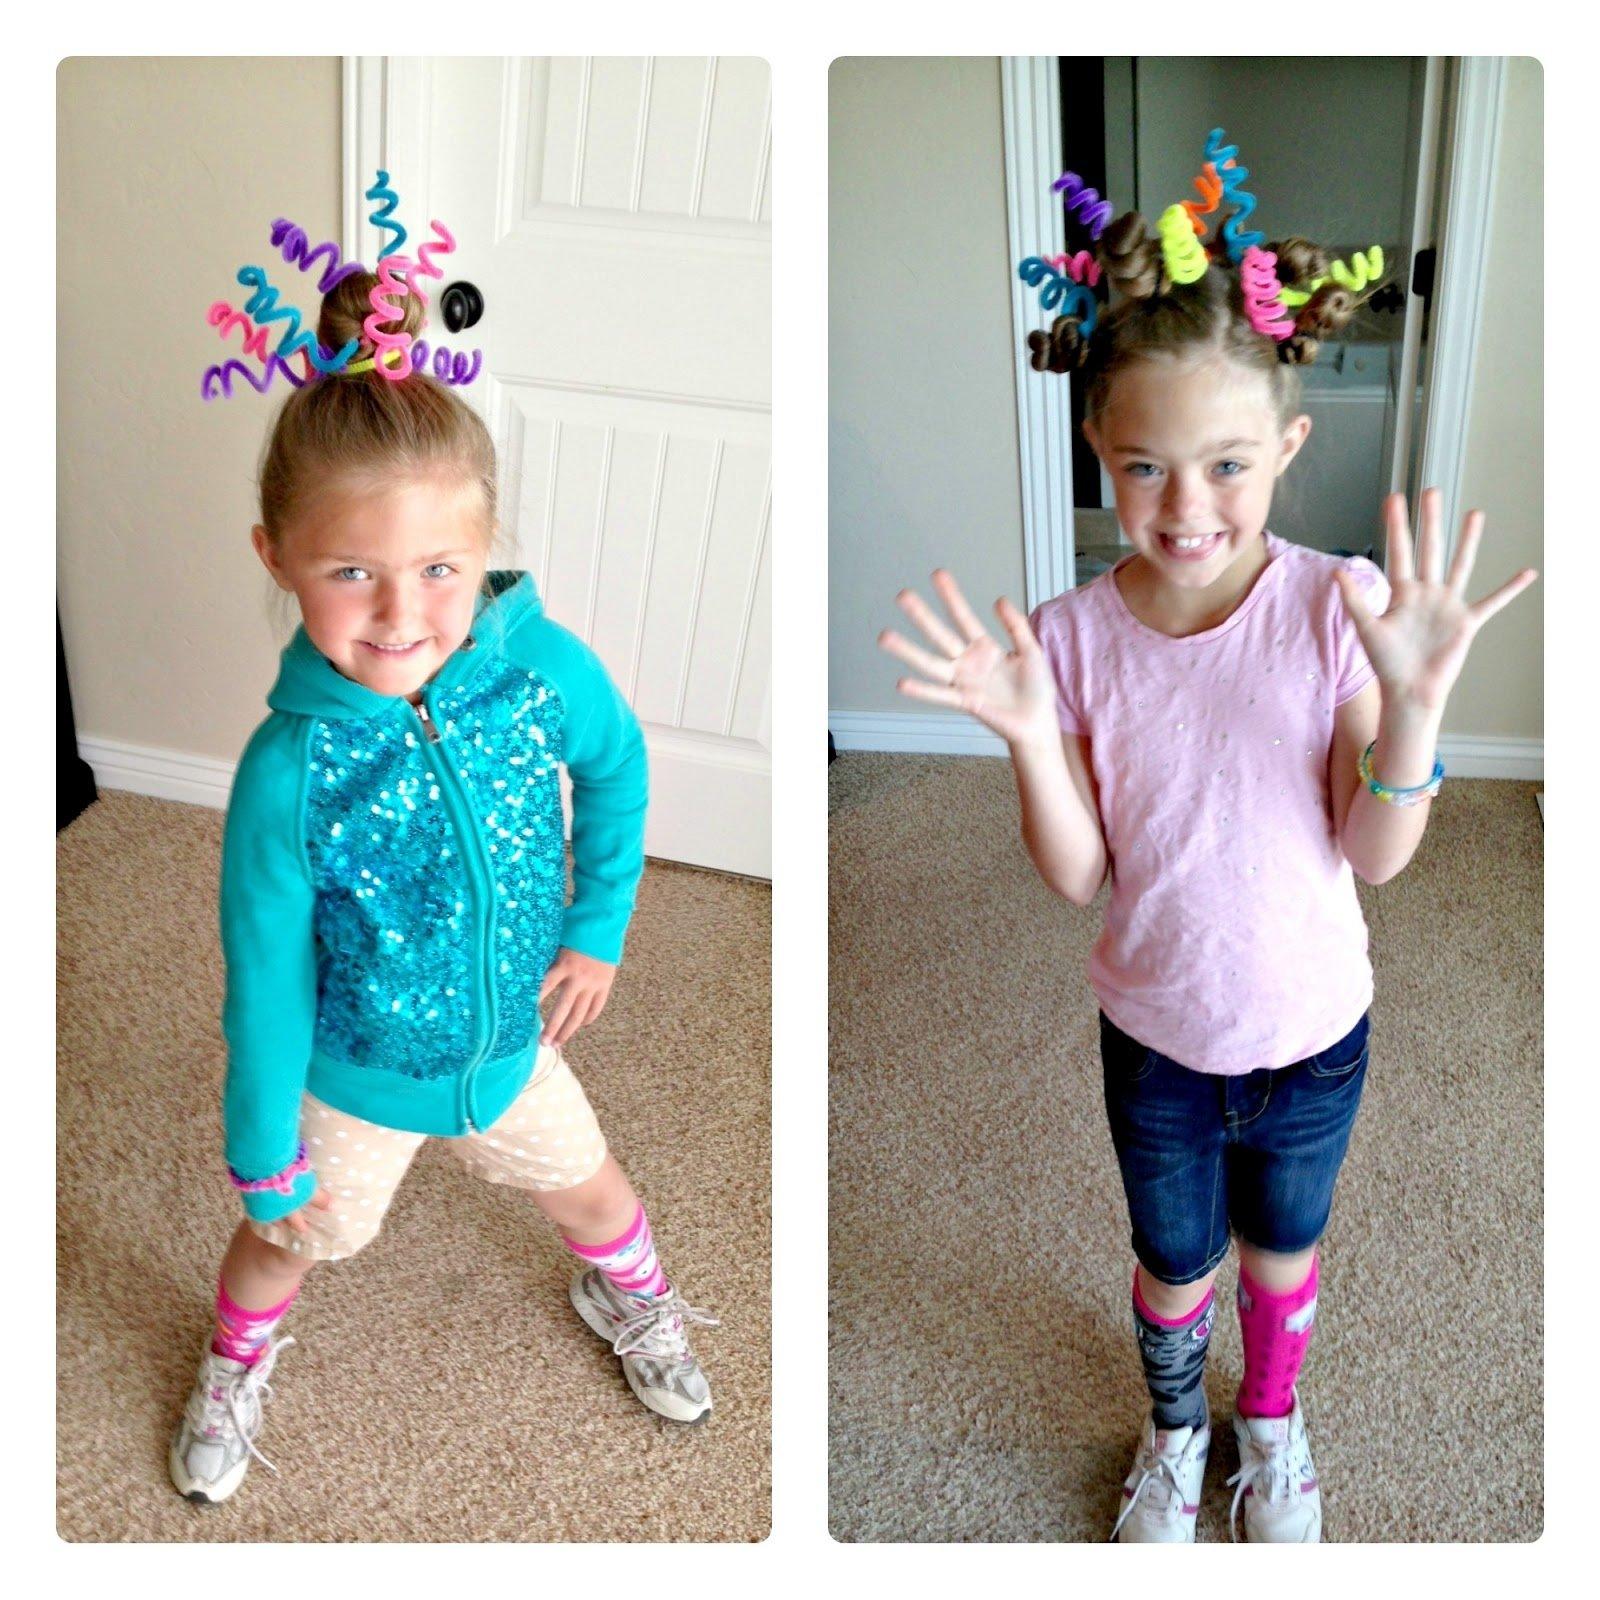 10 Fantastic Ideas Crazy Hair Day School blue skies ahead crazy hair day ideas 6 2021